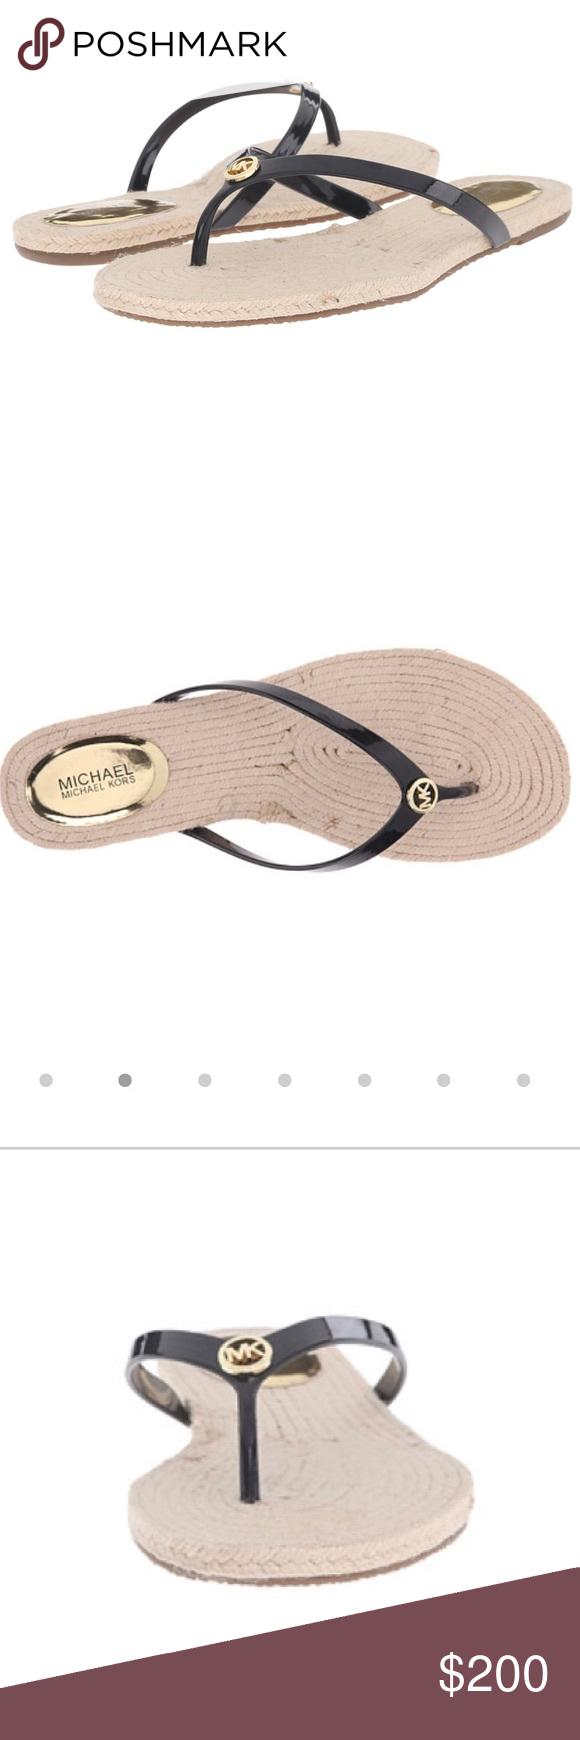 31e1f4bf1 Micheal Kors  hazel  espadrille flat thong sandal